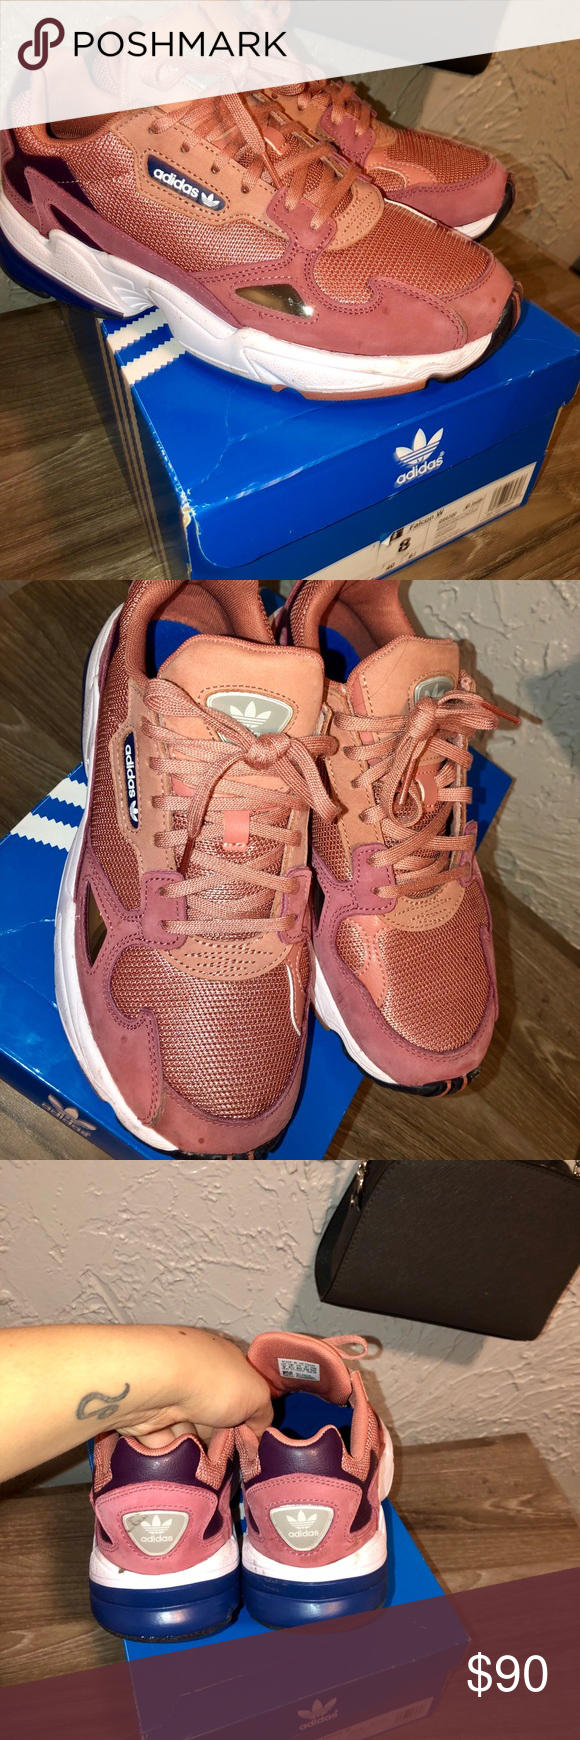 Adidas falcon salmon pink sneakers